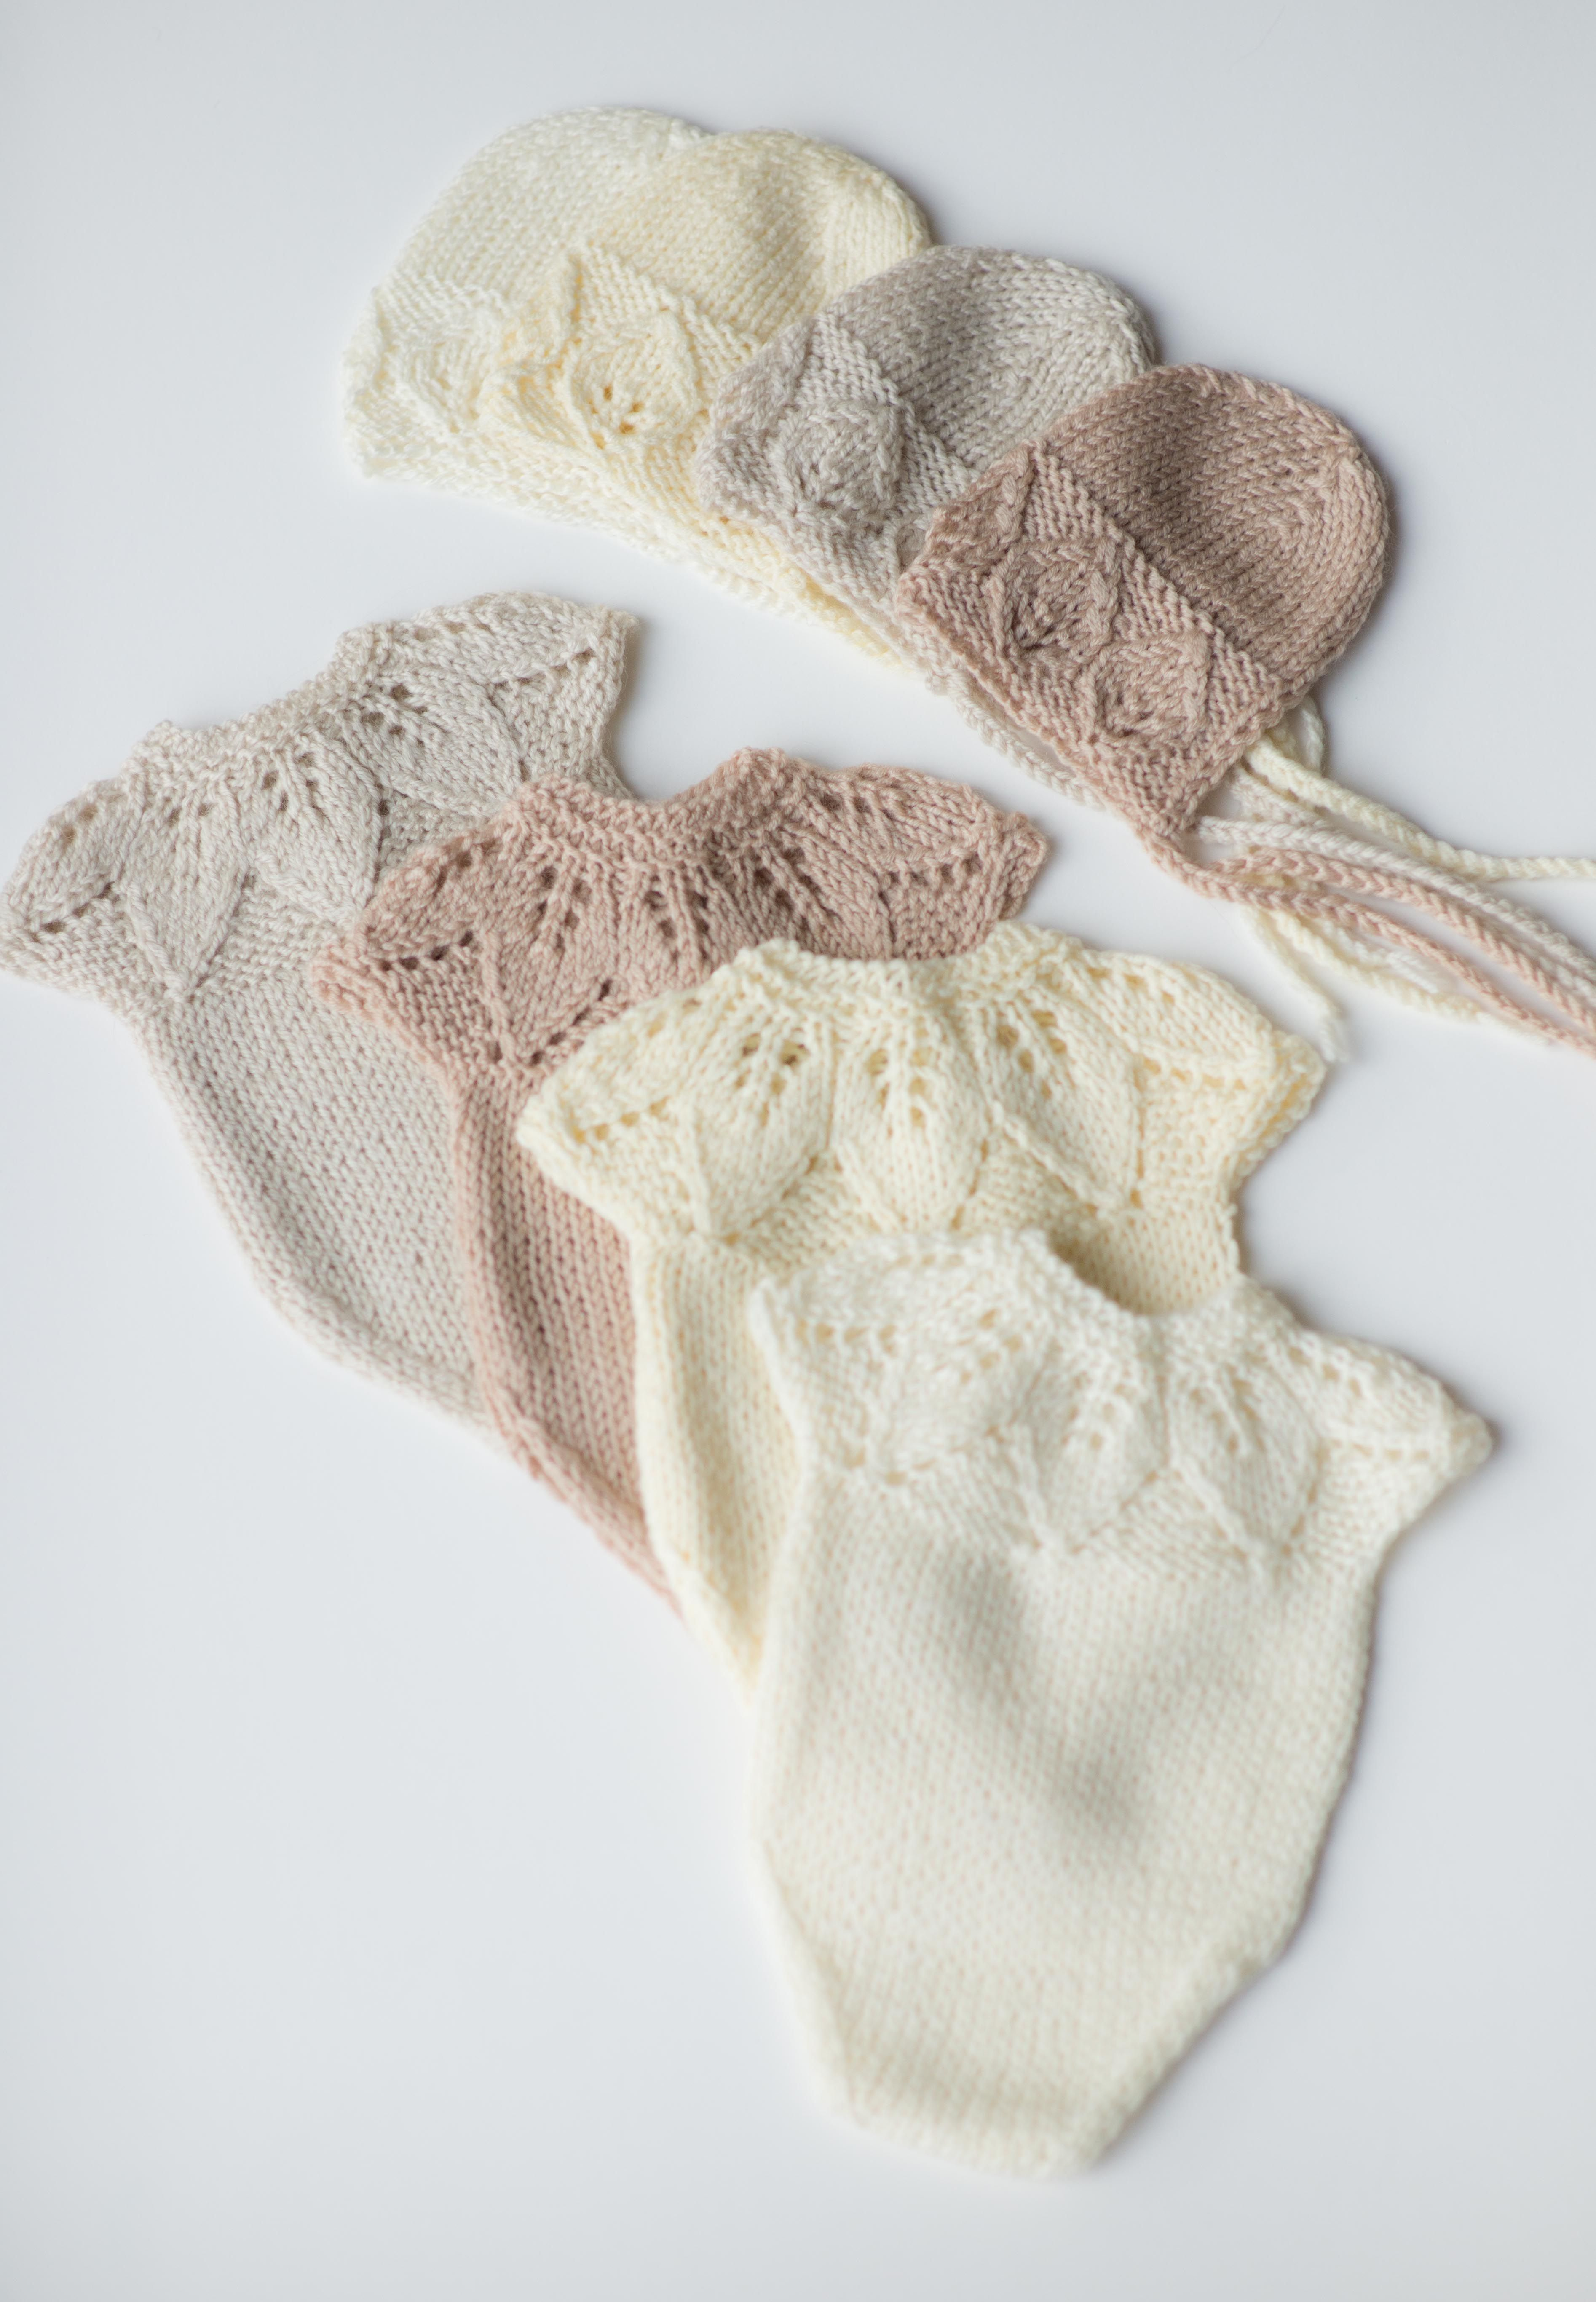 Newborn prop girl ivory romper bonnet set knit photo prop outfit